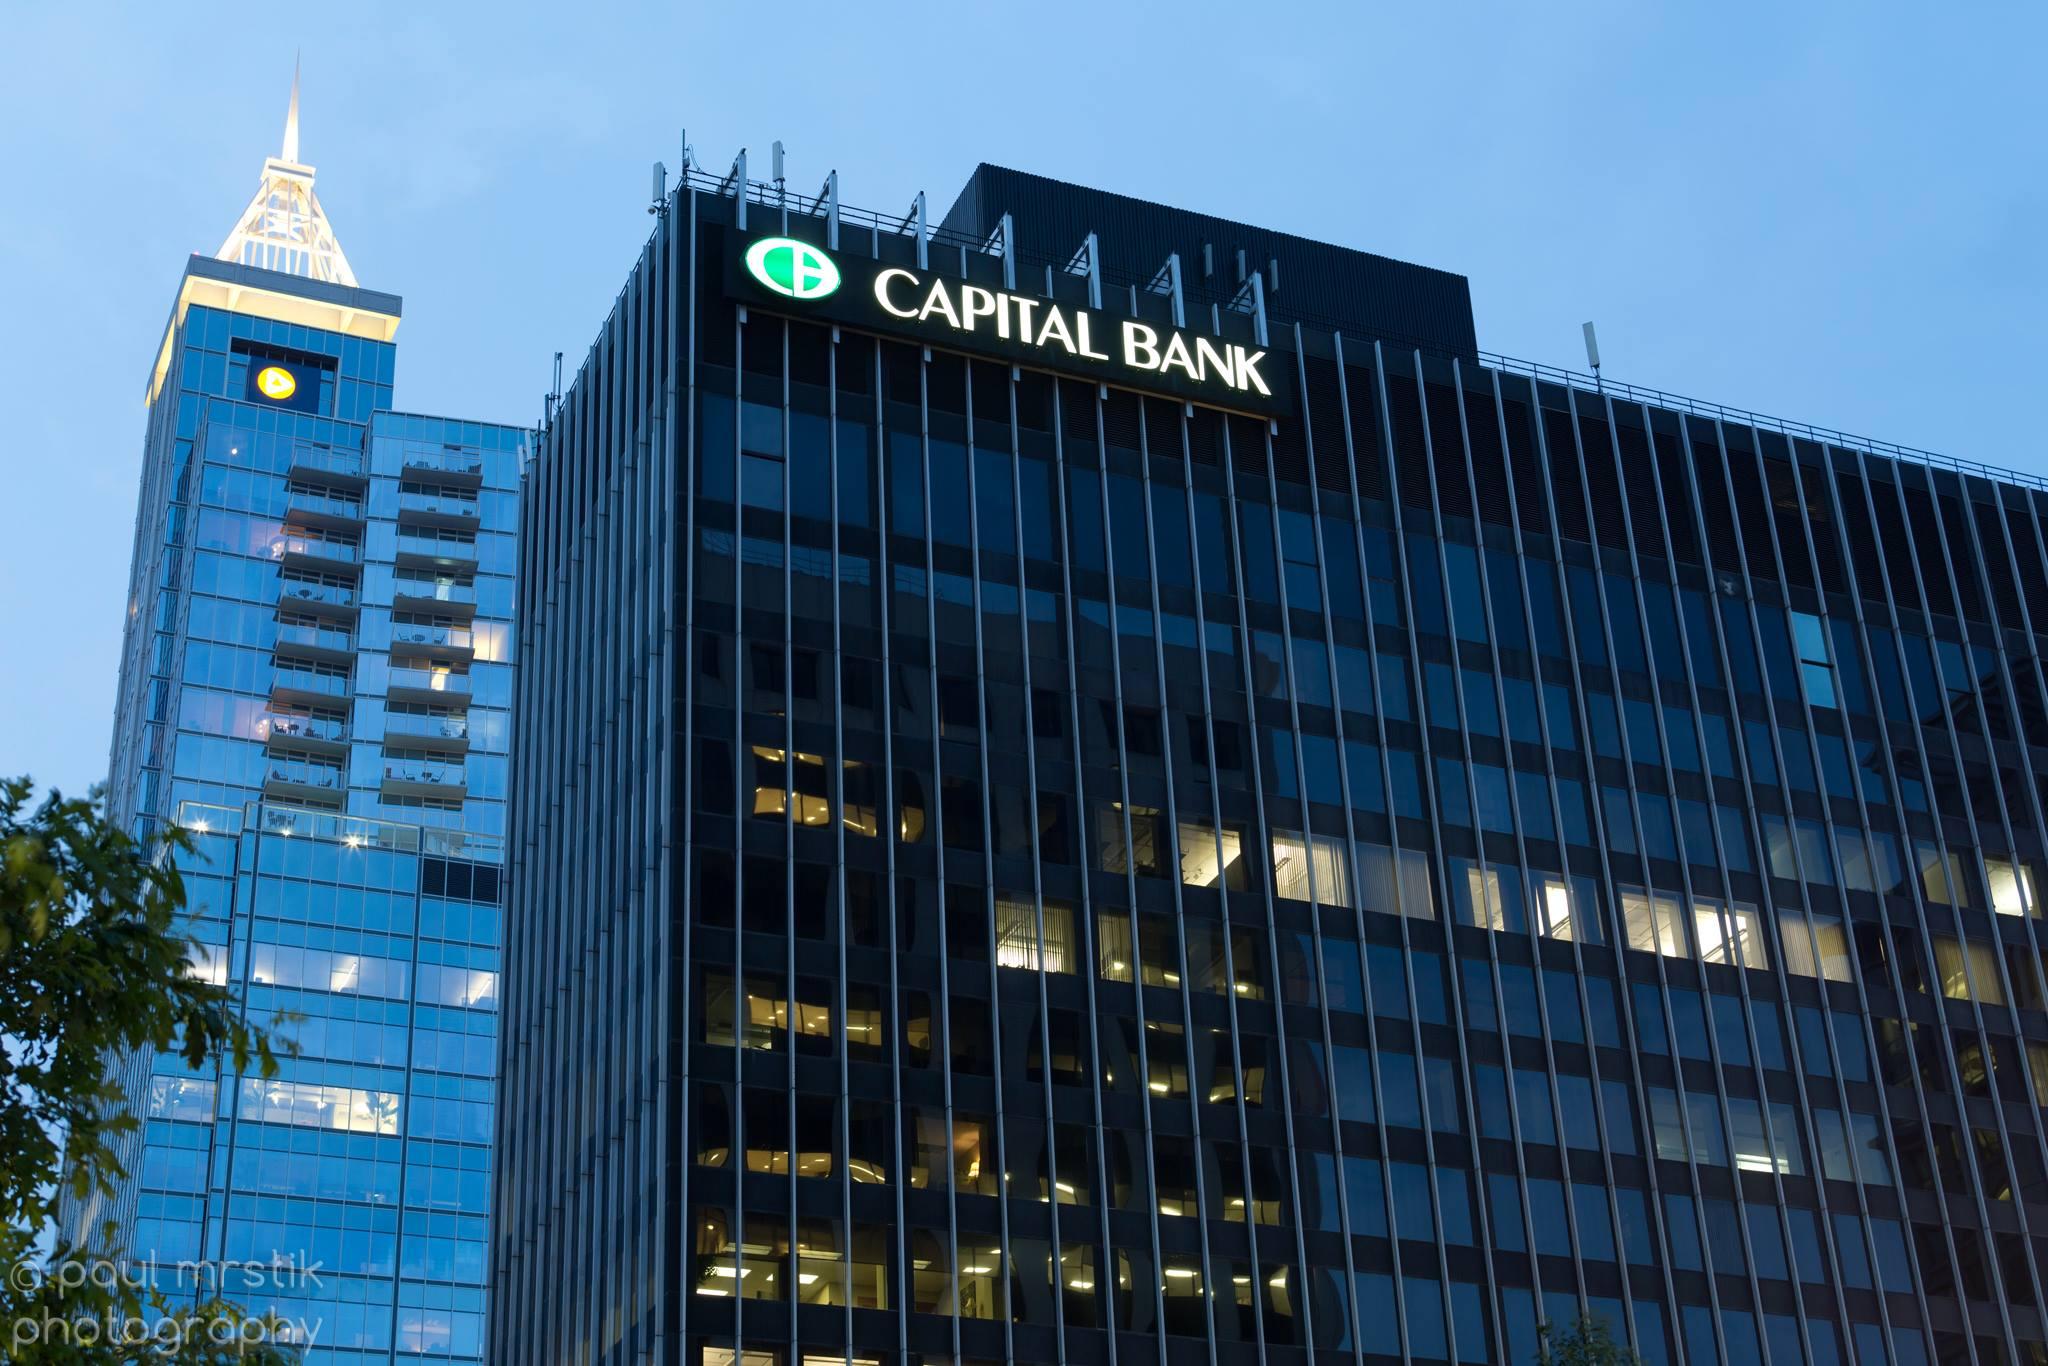 Capital Bank Plaza - Visit Website